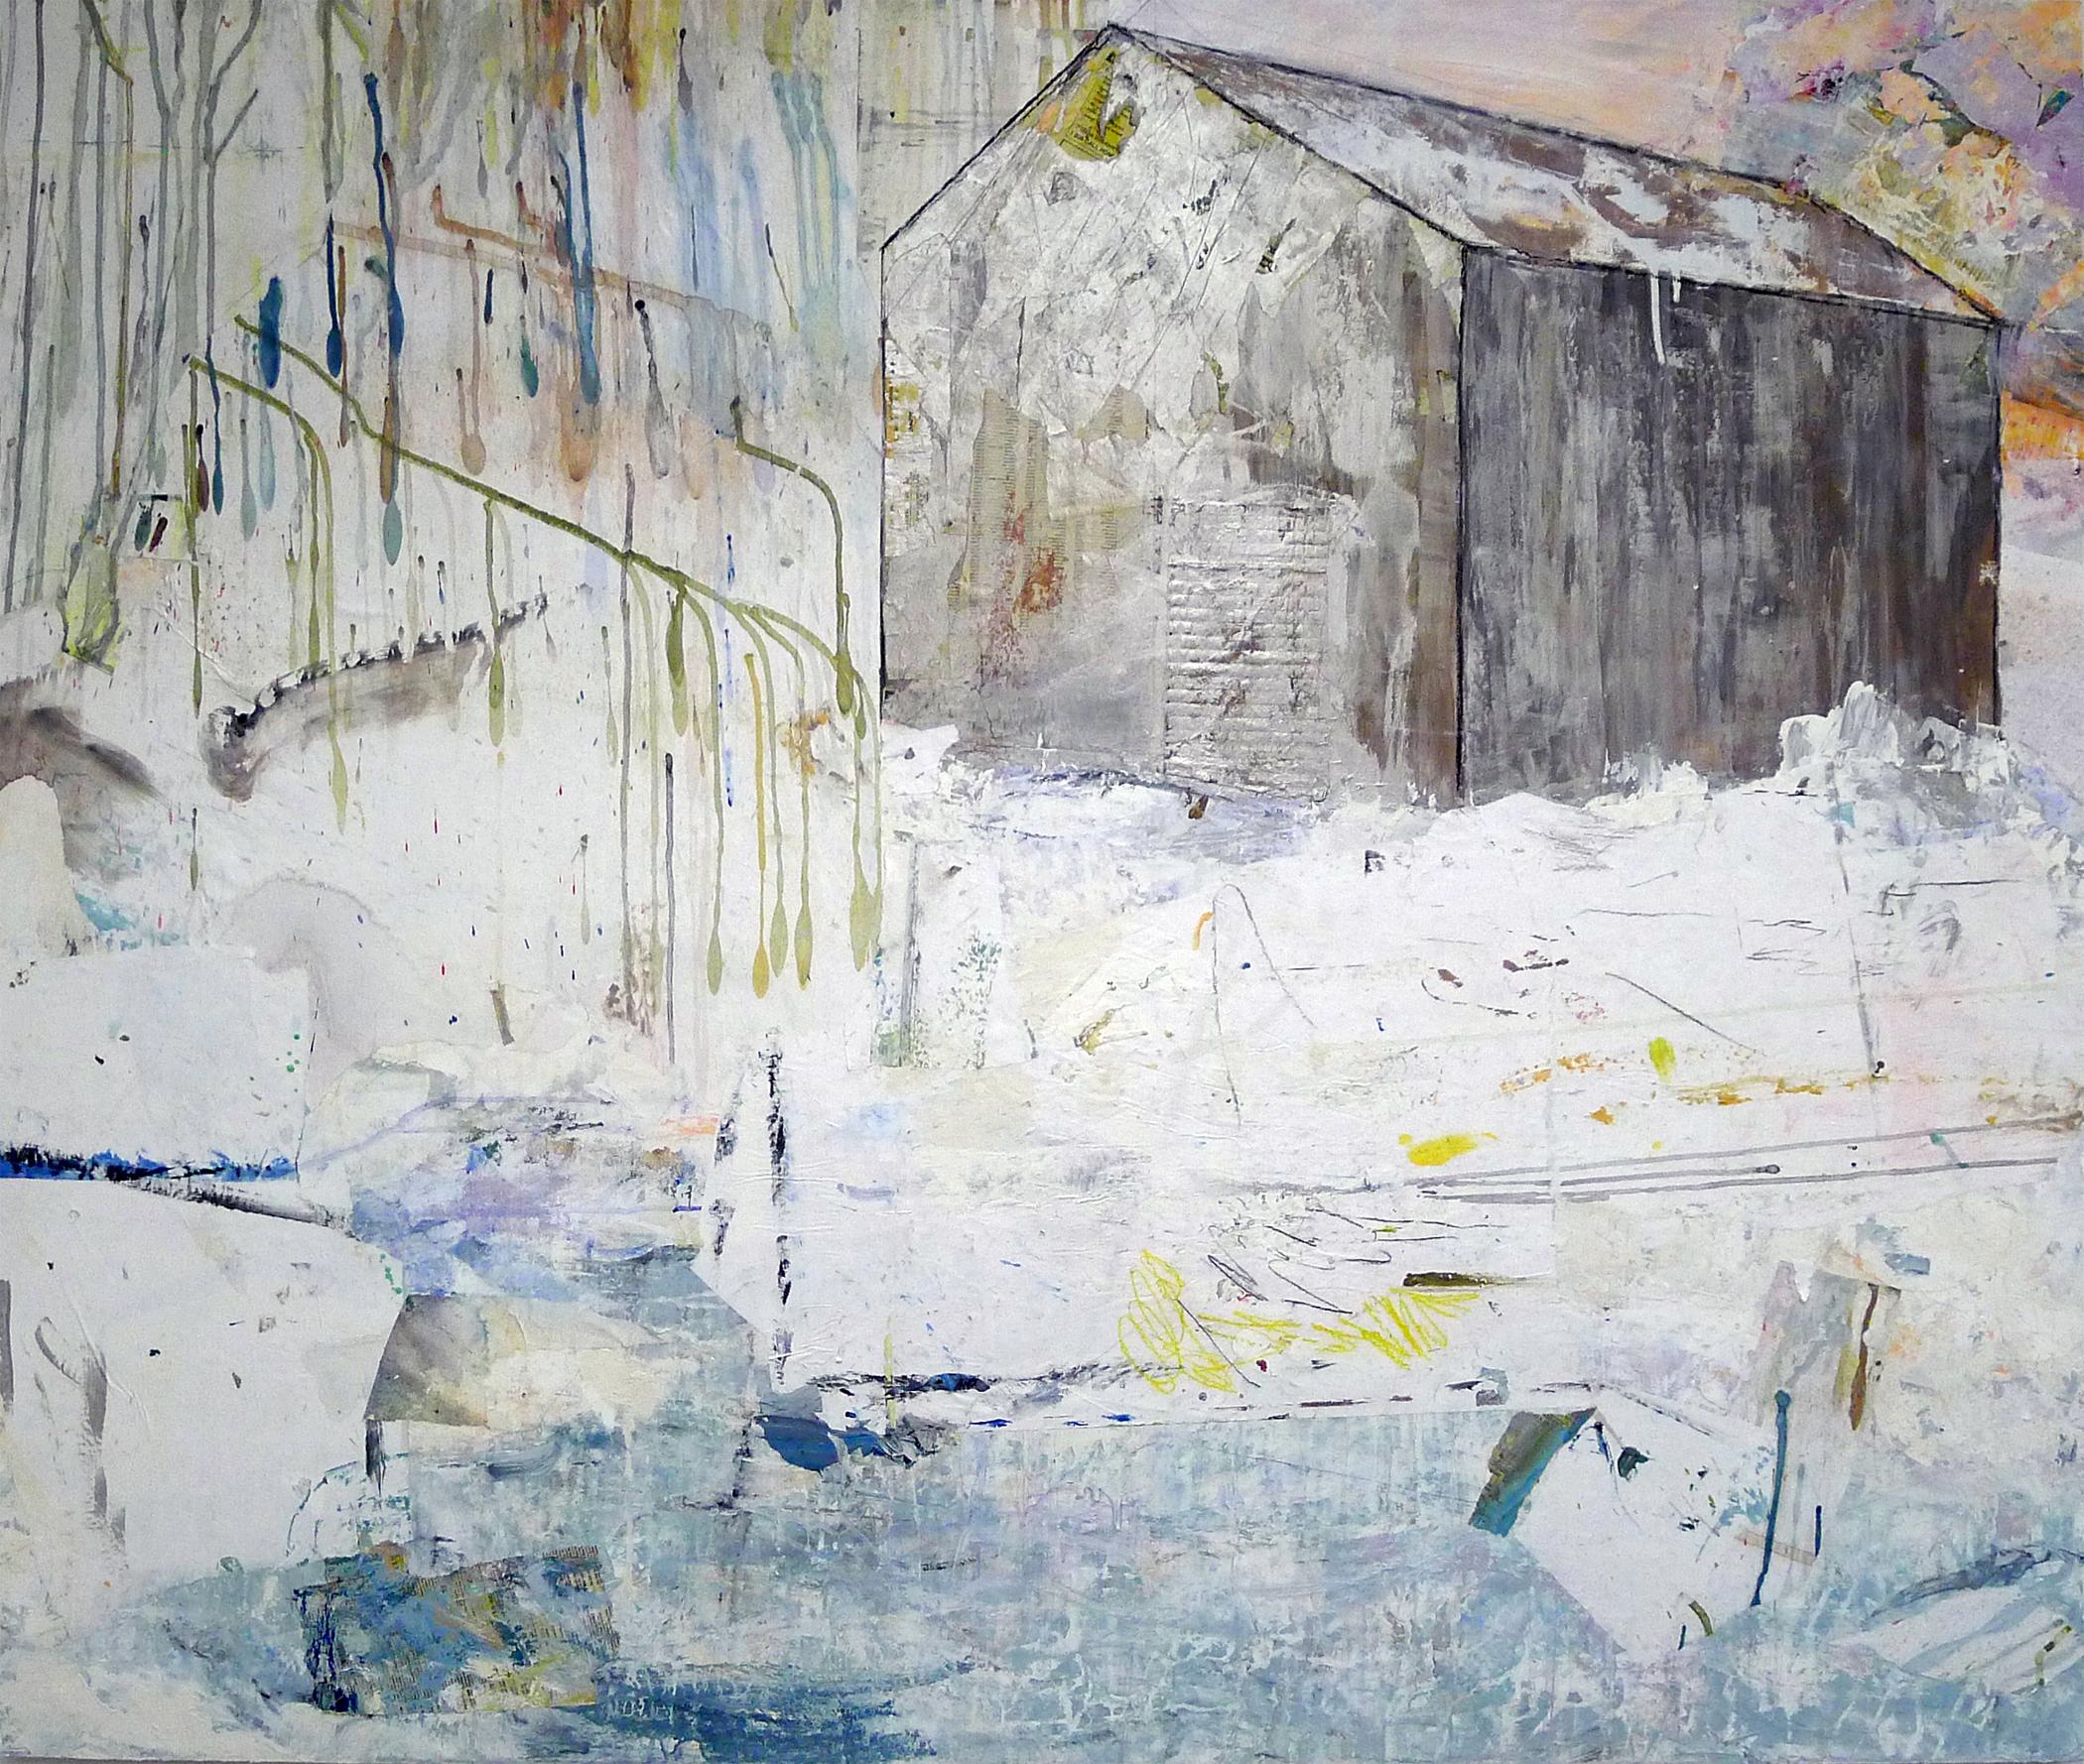 Brenda Cirioni,  Barn Series: Honor, Mixed media painting, 40x48